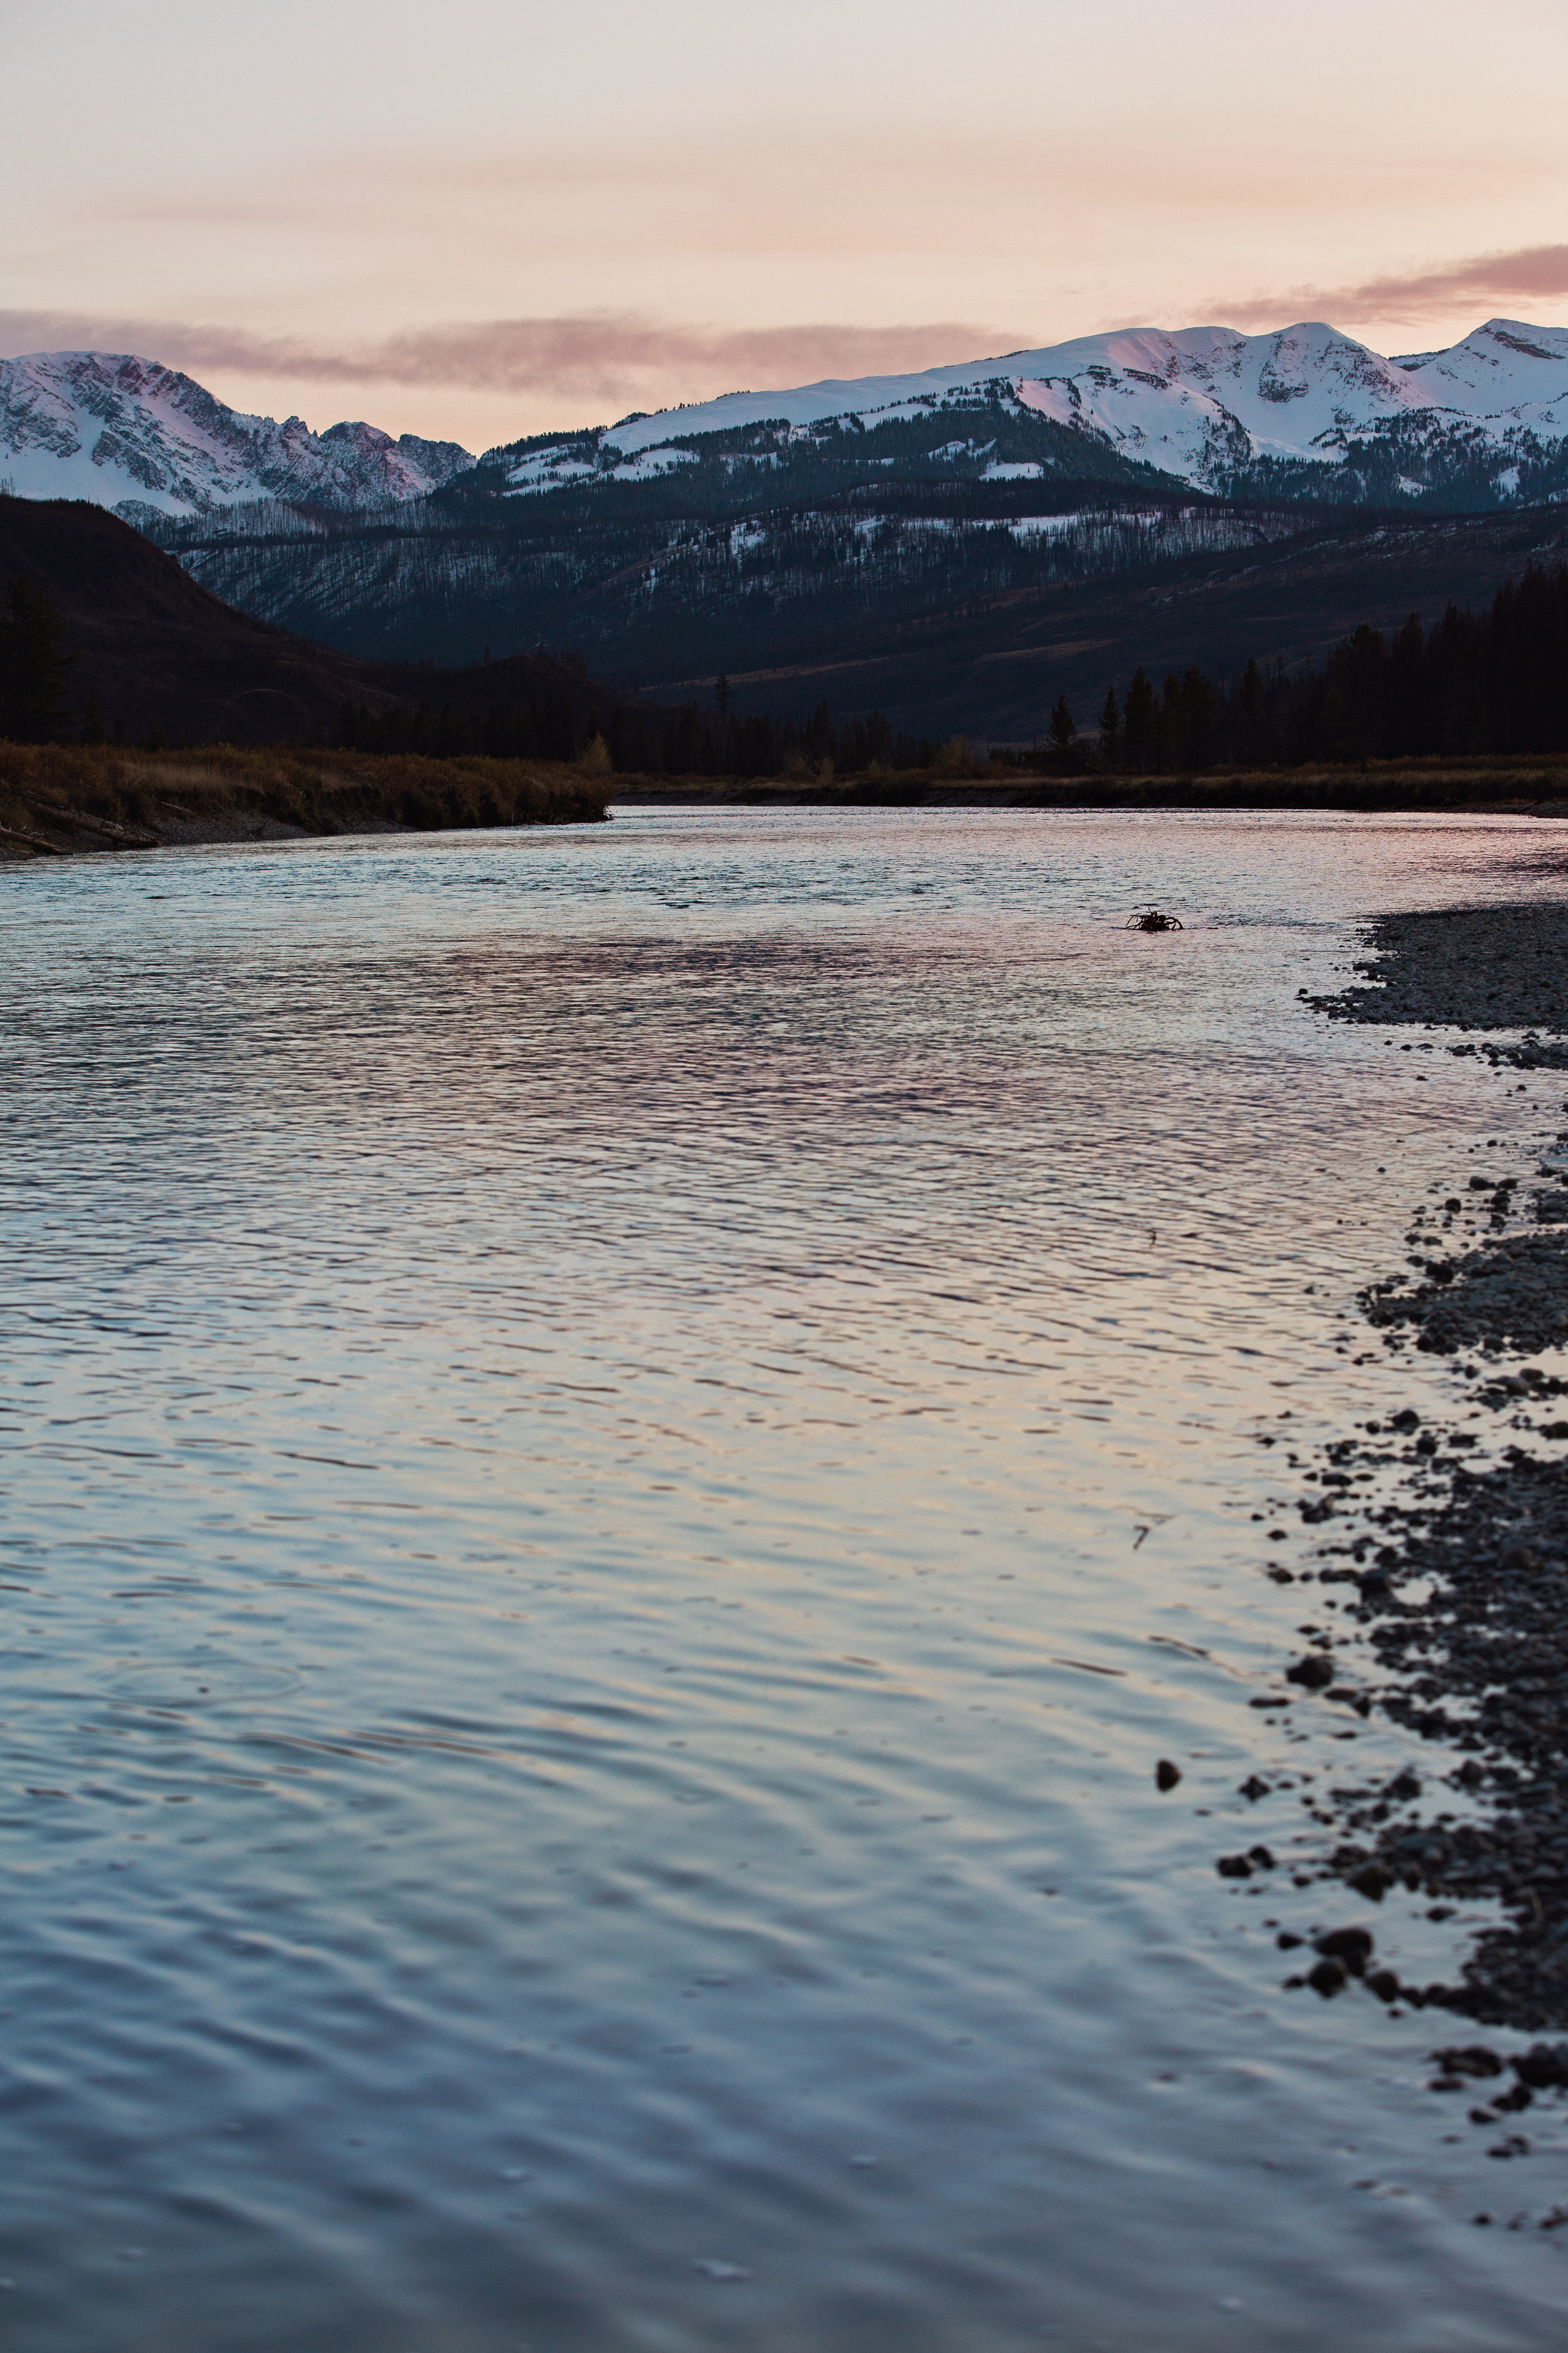 CindyGiovagnoli_Yellowstone_Grand_Teton_National_Park_Wyoming_mountains_deer_sunset_fall_autumn_October_alpenglow-005.jpg